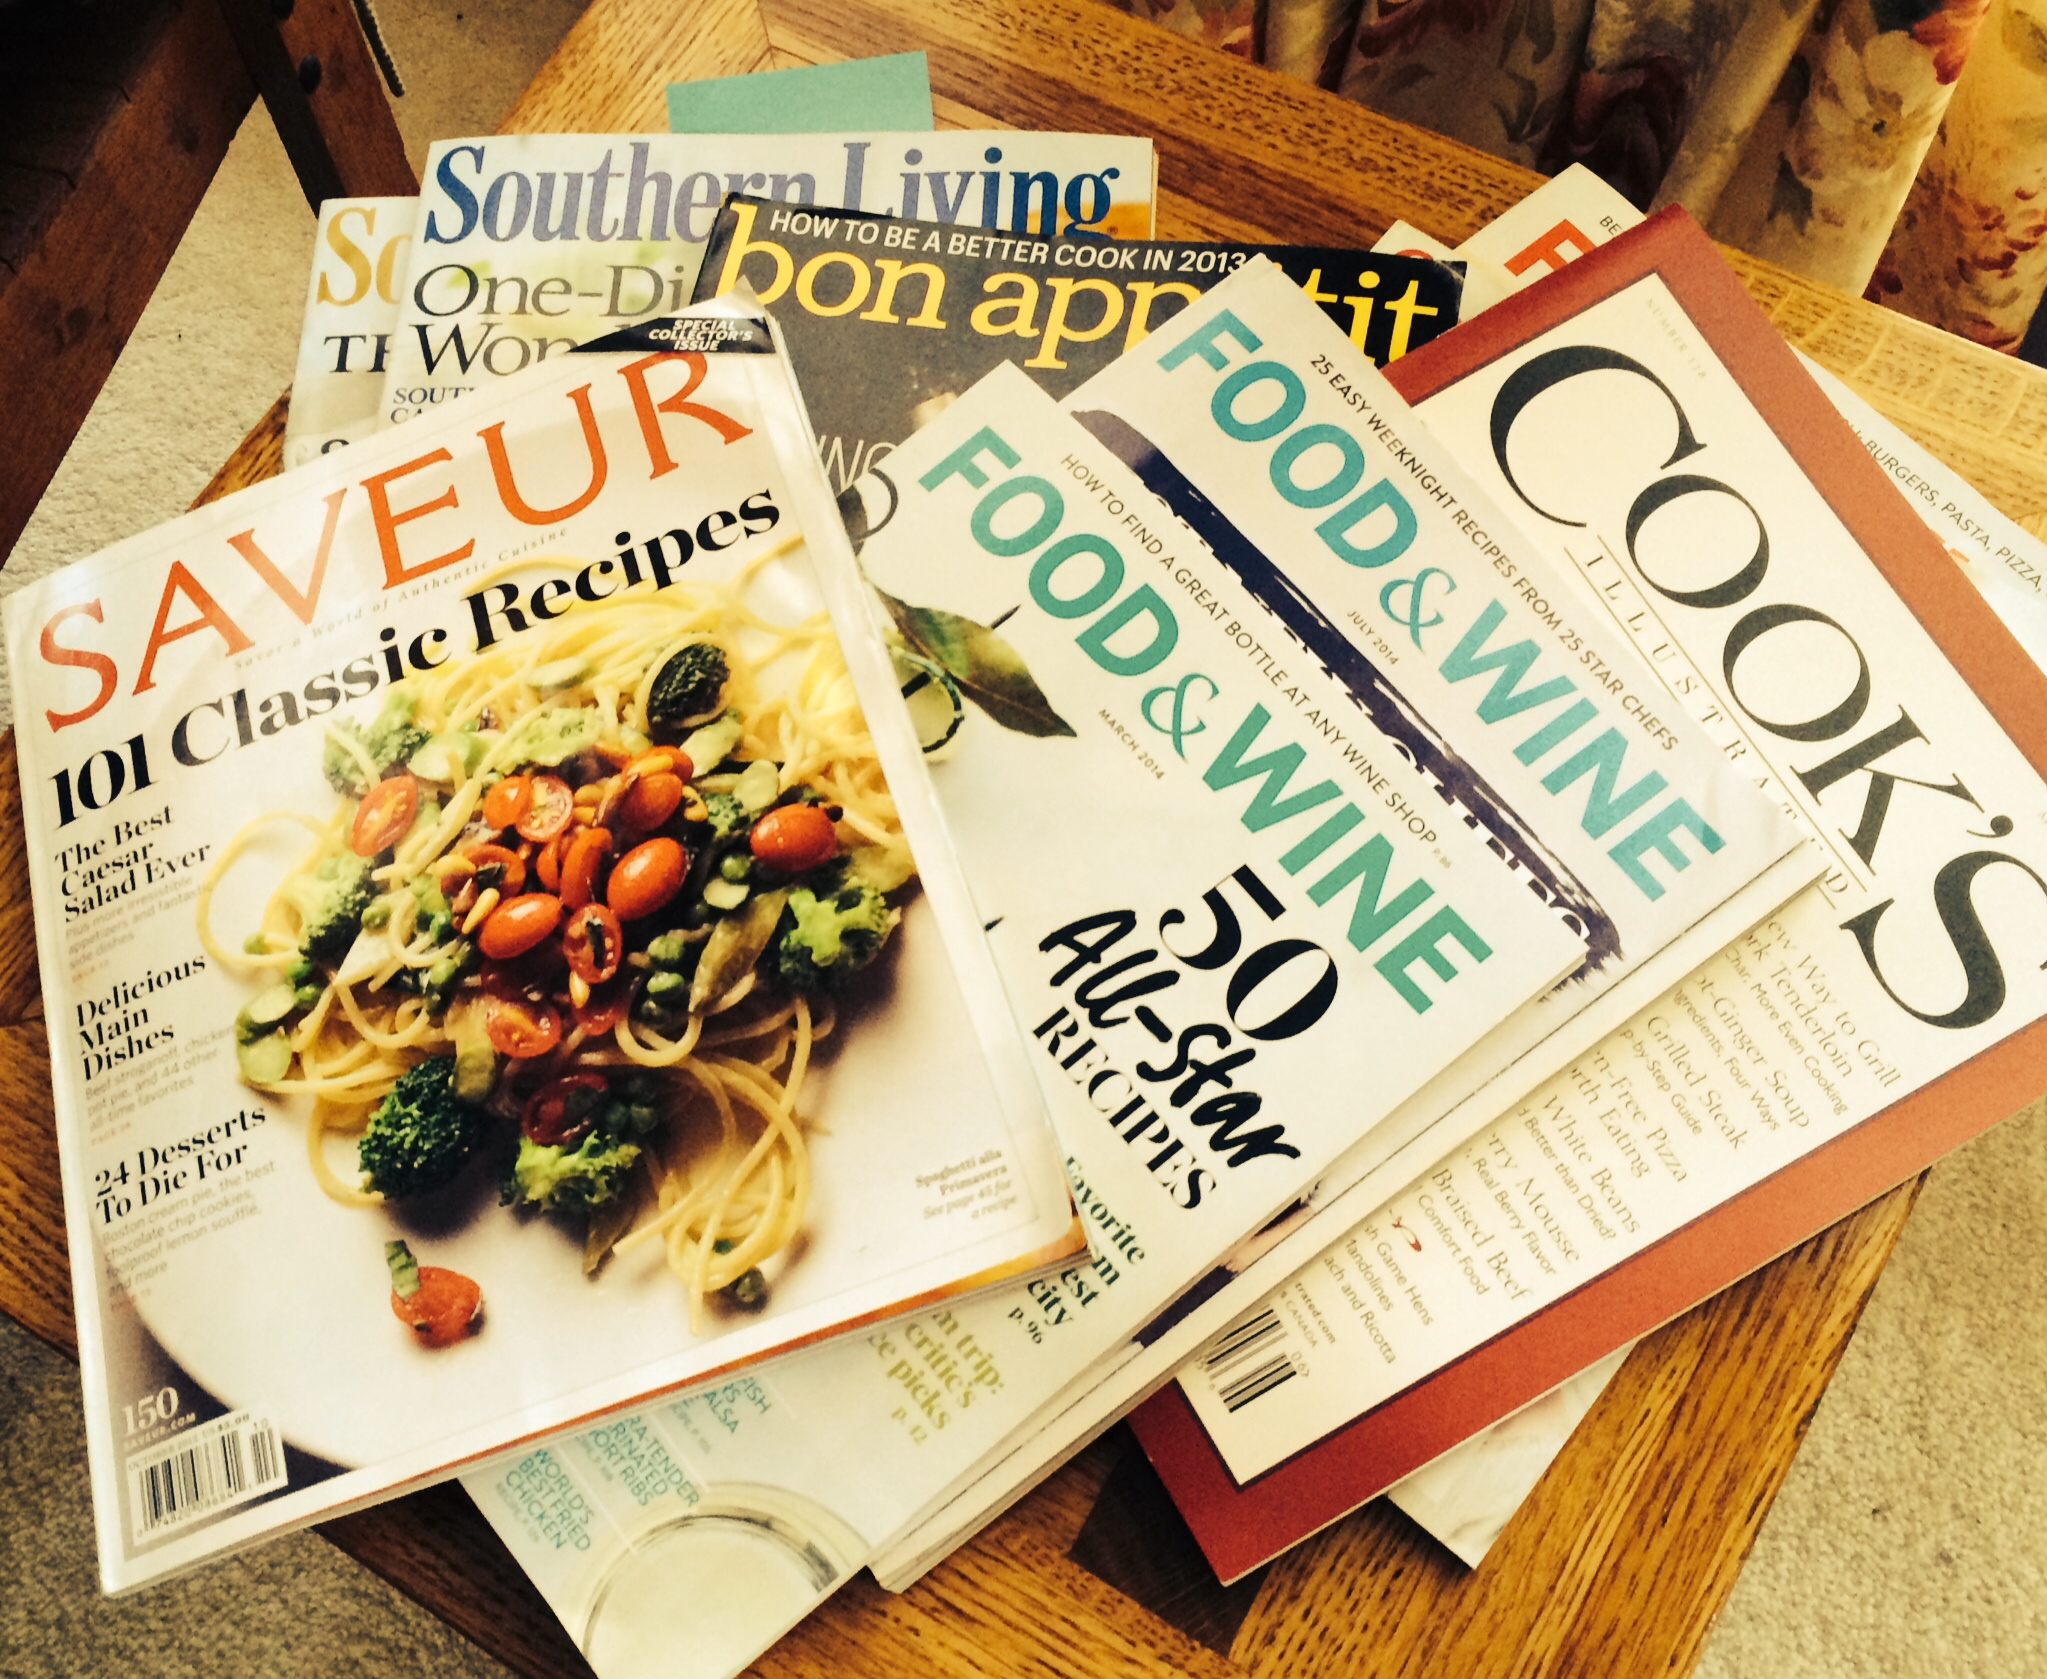 Food Magazine Treasures:  Serrano Ham and Corn Pudding